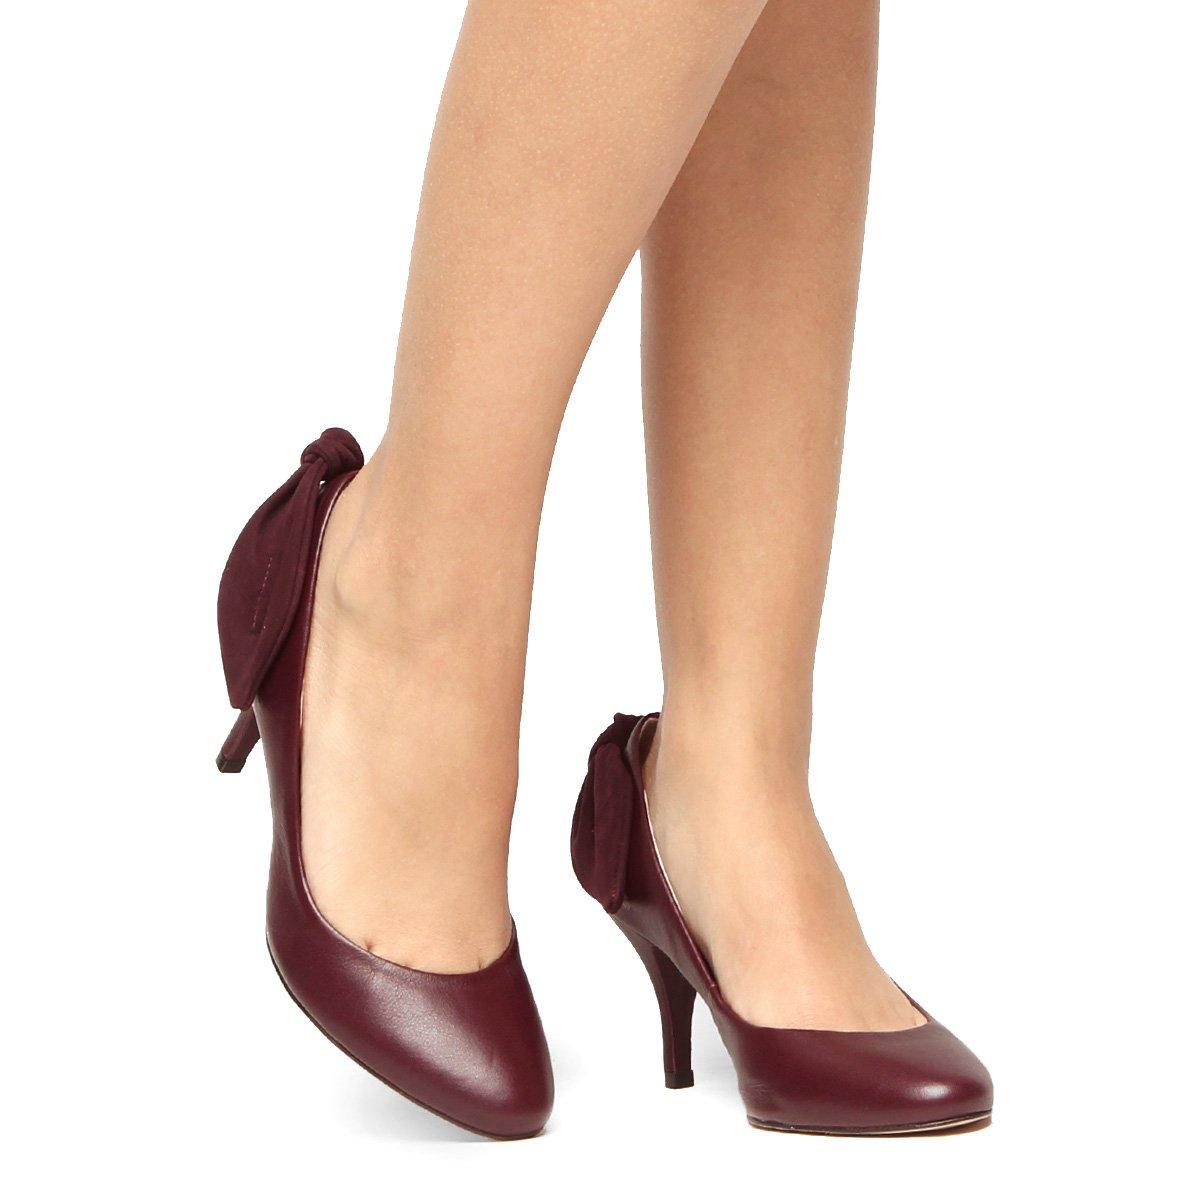 c2df2d1835 Scarpin Couro Shoestock Salto Médio - Compre Agora